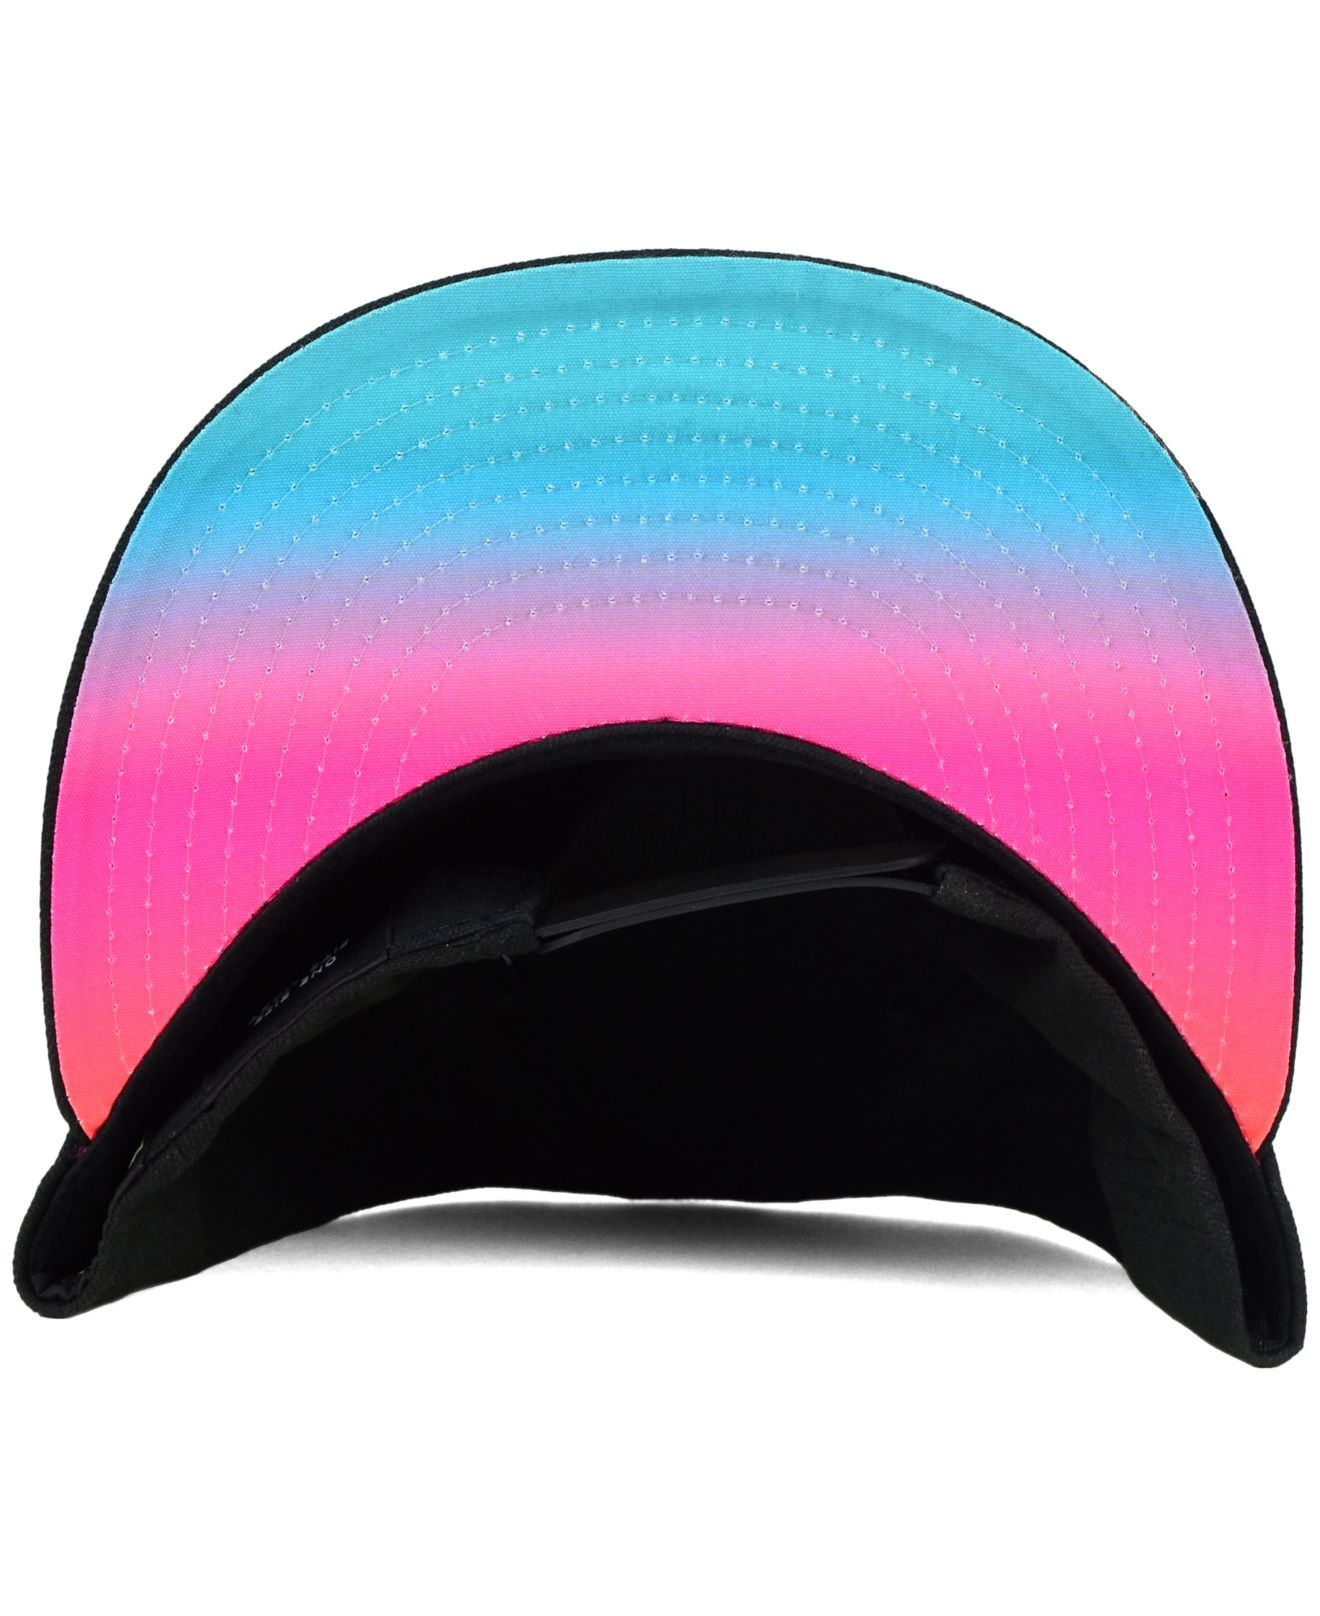 6181be2d99f ... wholesale lyst ktz san antonio spurs fade to script 9fifty snapback cap  in black for men